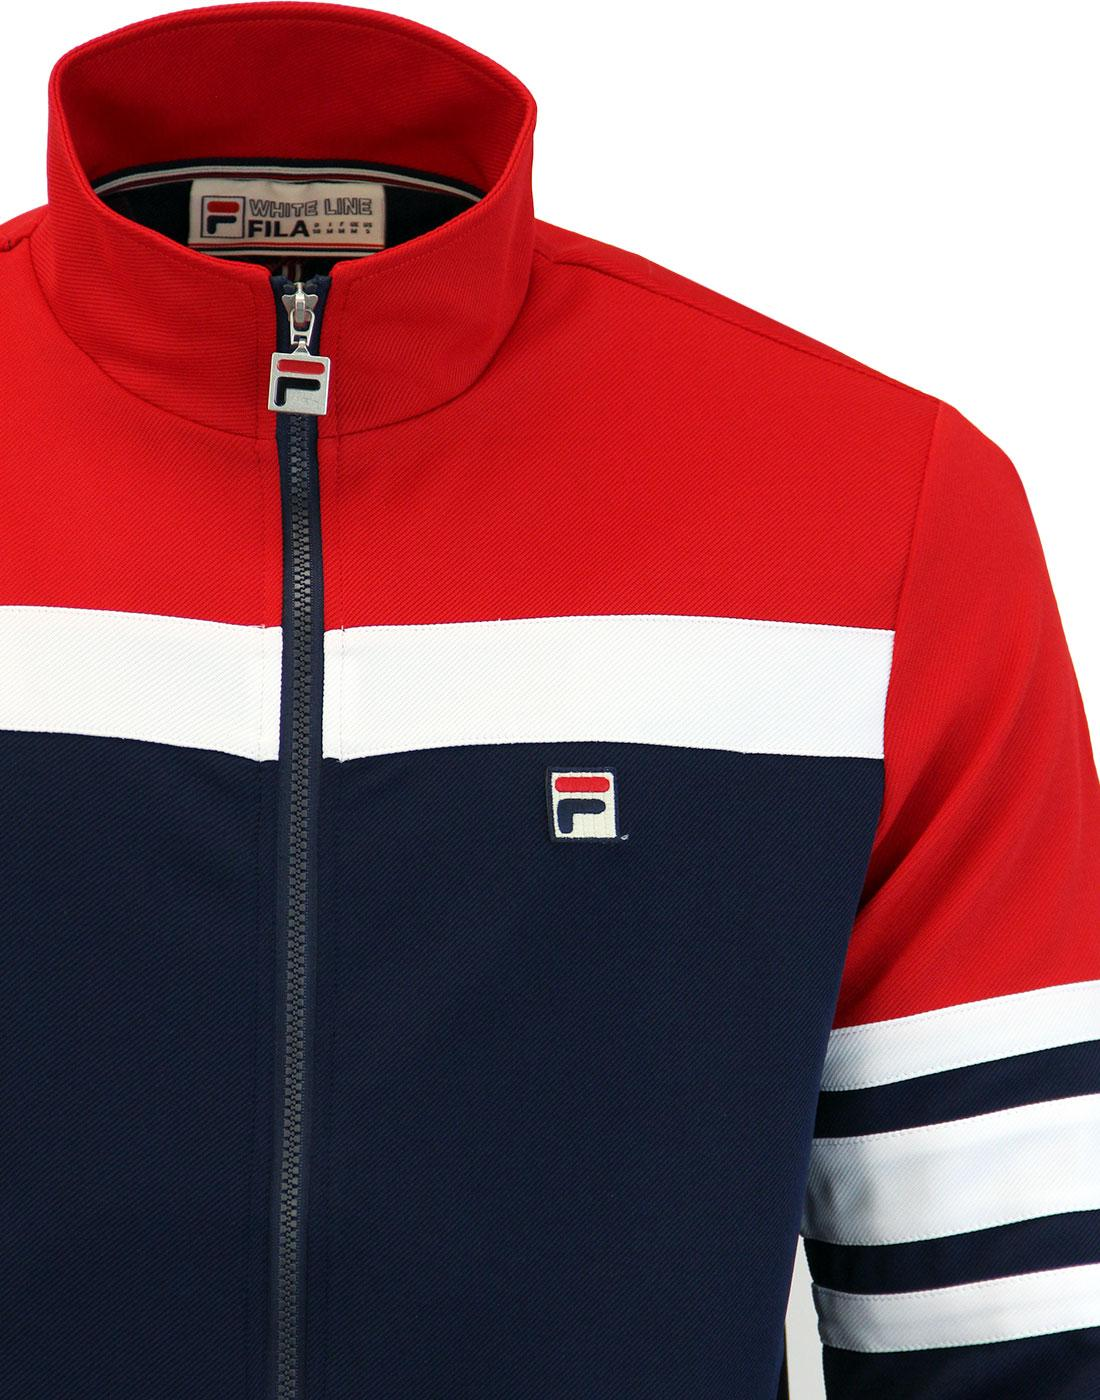 4d24560e7a19 FILA VINTAGE Courto men s Retro 80s Stripe Track Jacket Peacoat